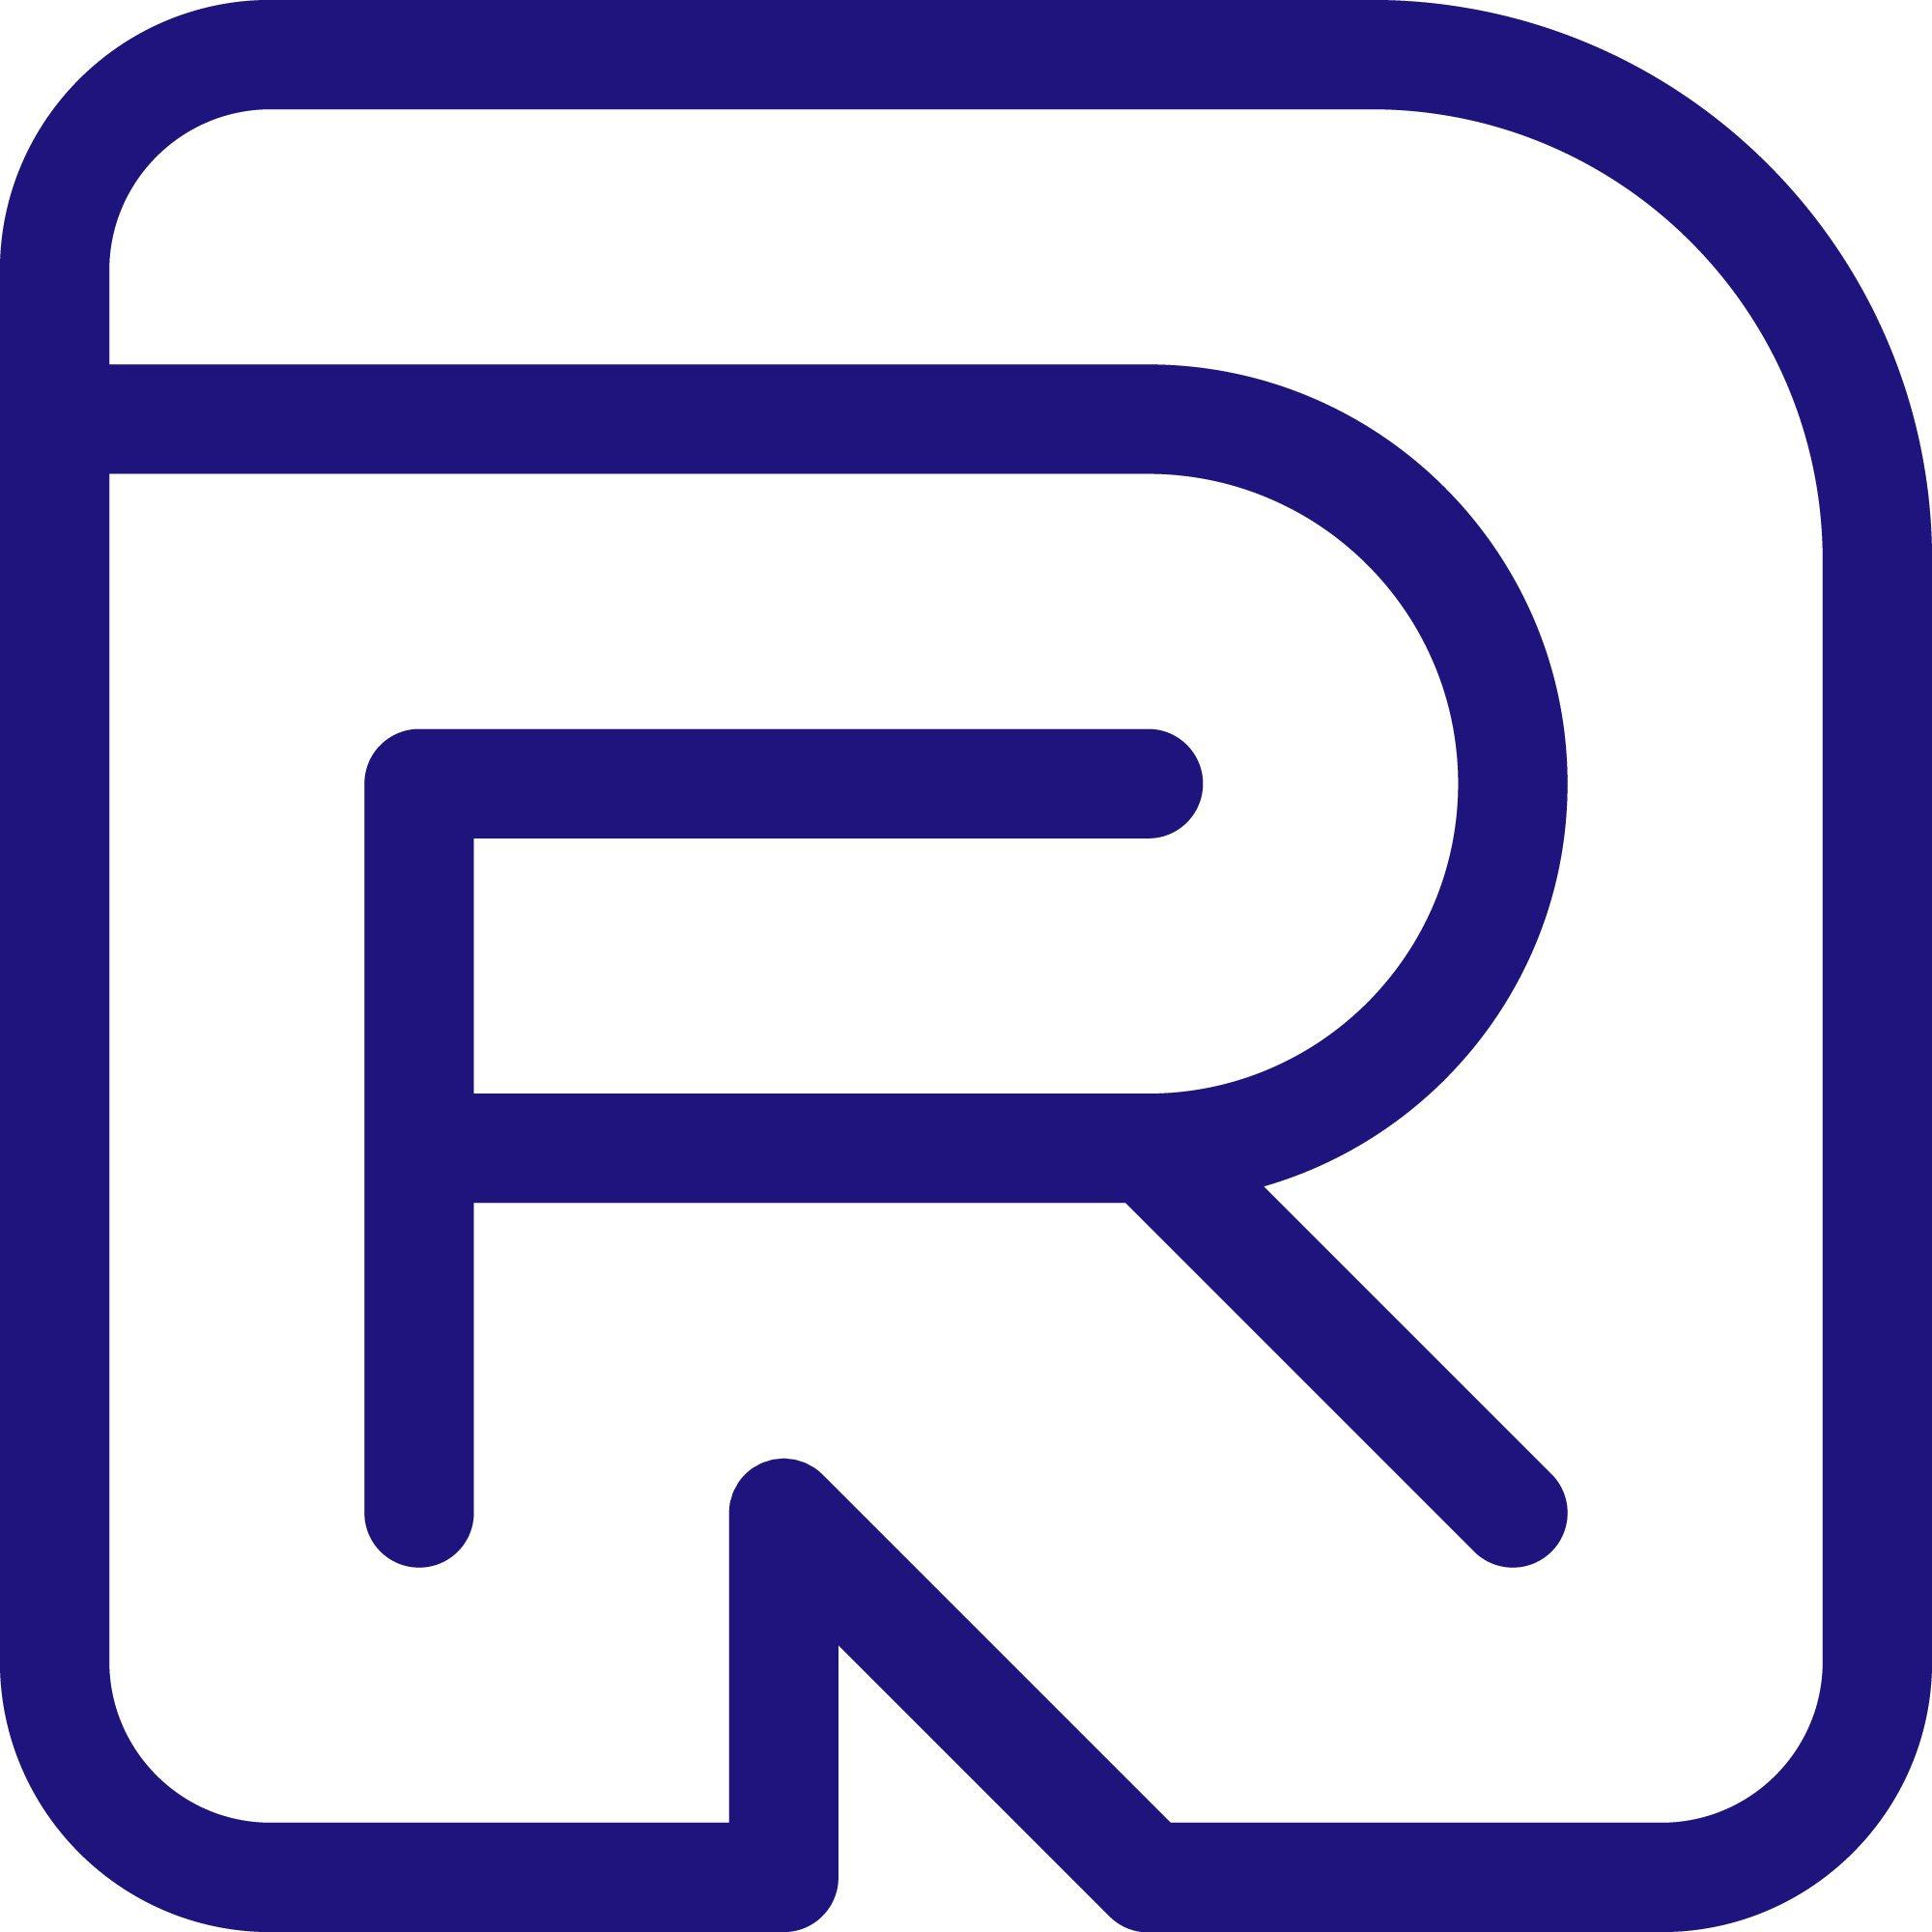 Rollio_R_blue_2000px